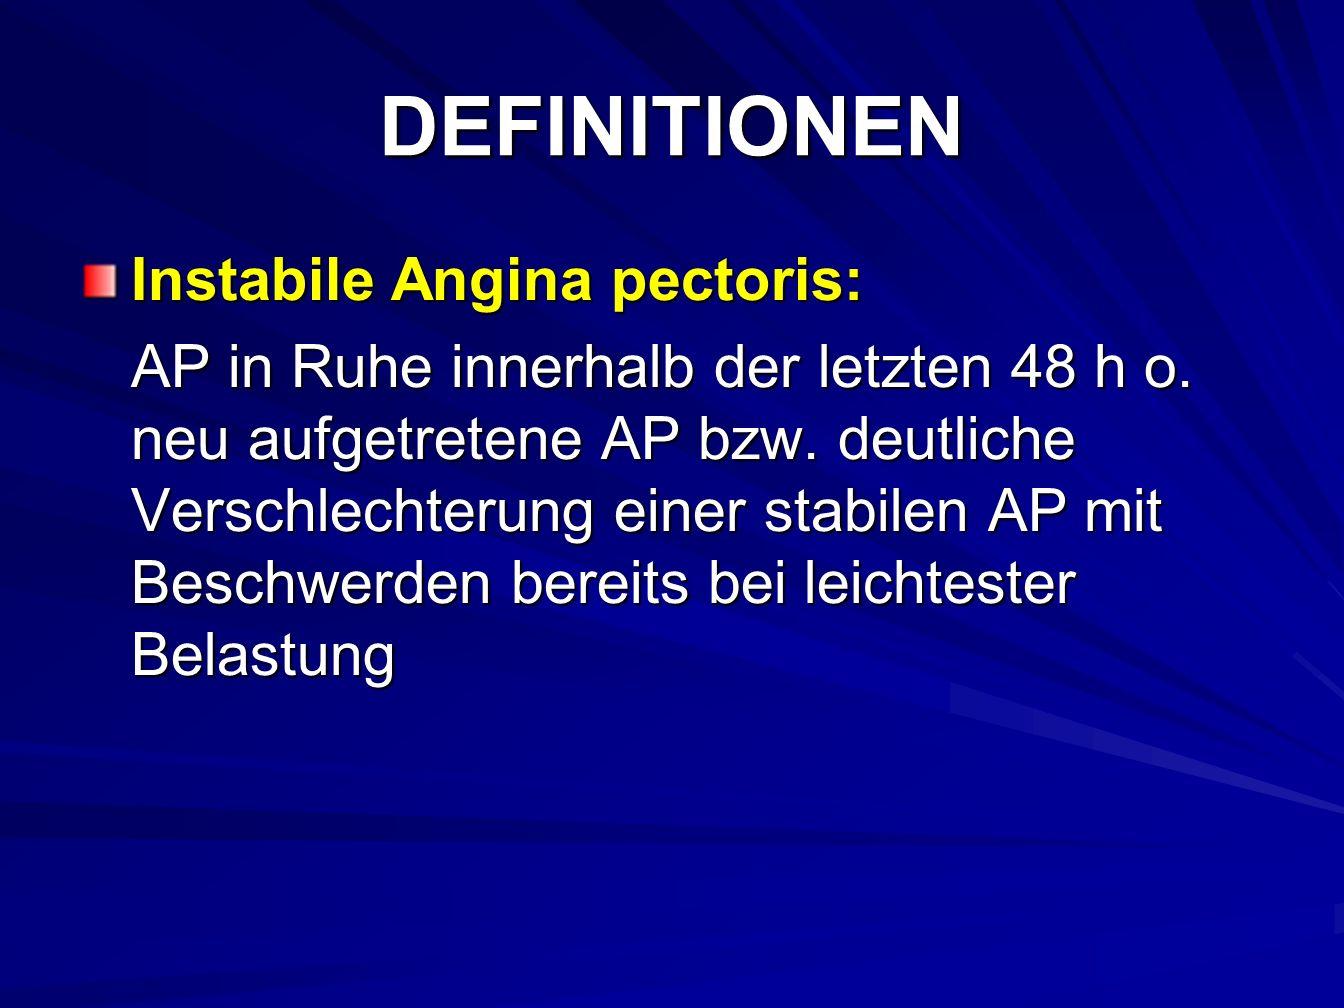 DEFINITIONEN Instabile Angina pectoris: